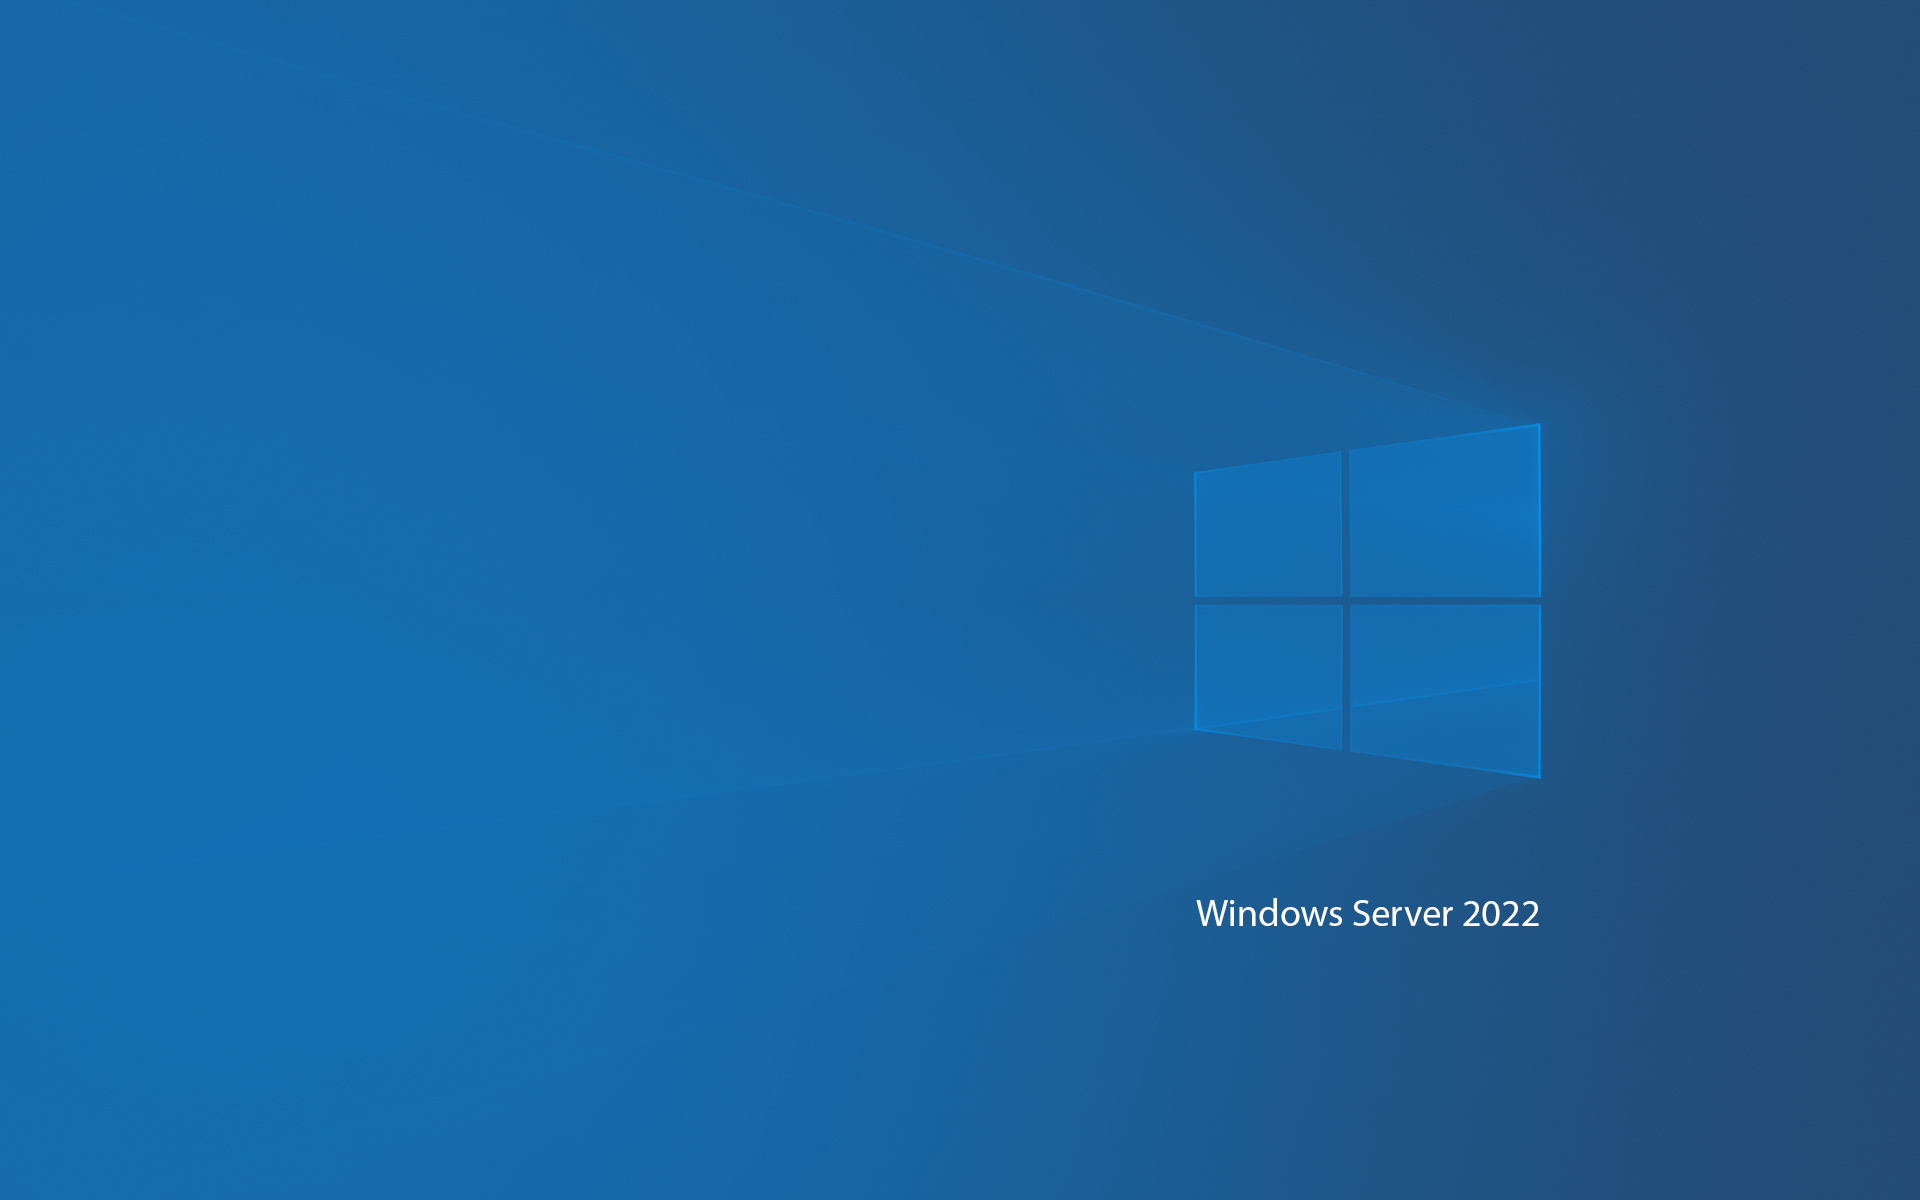 Windows Server 2022 Wallpaper Classic Blue